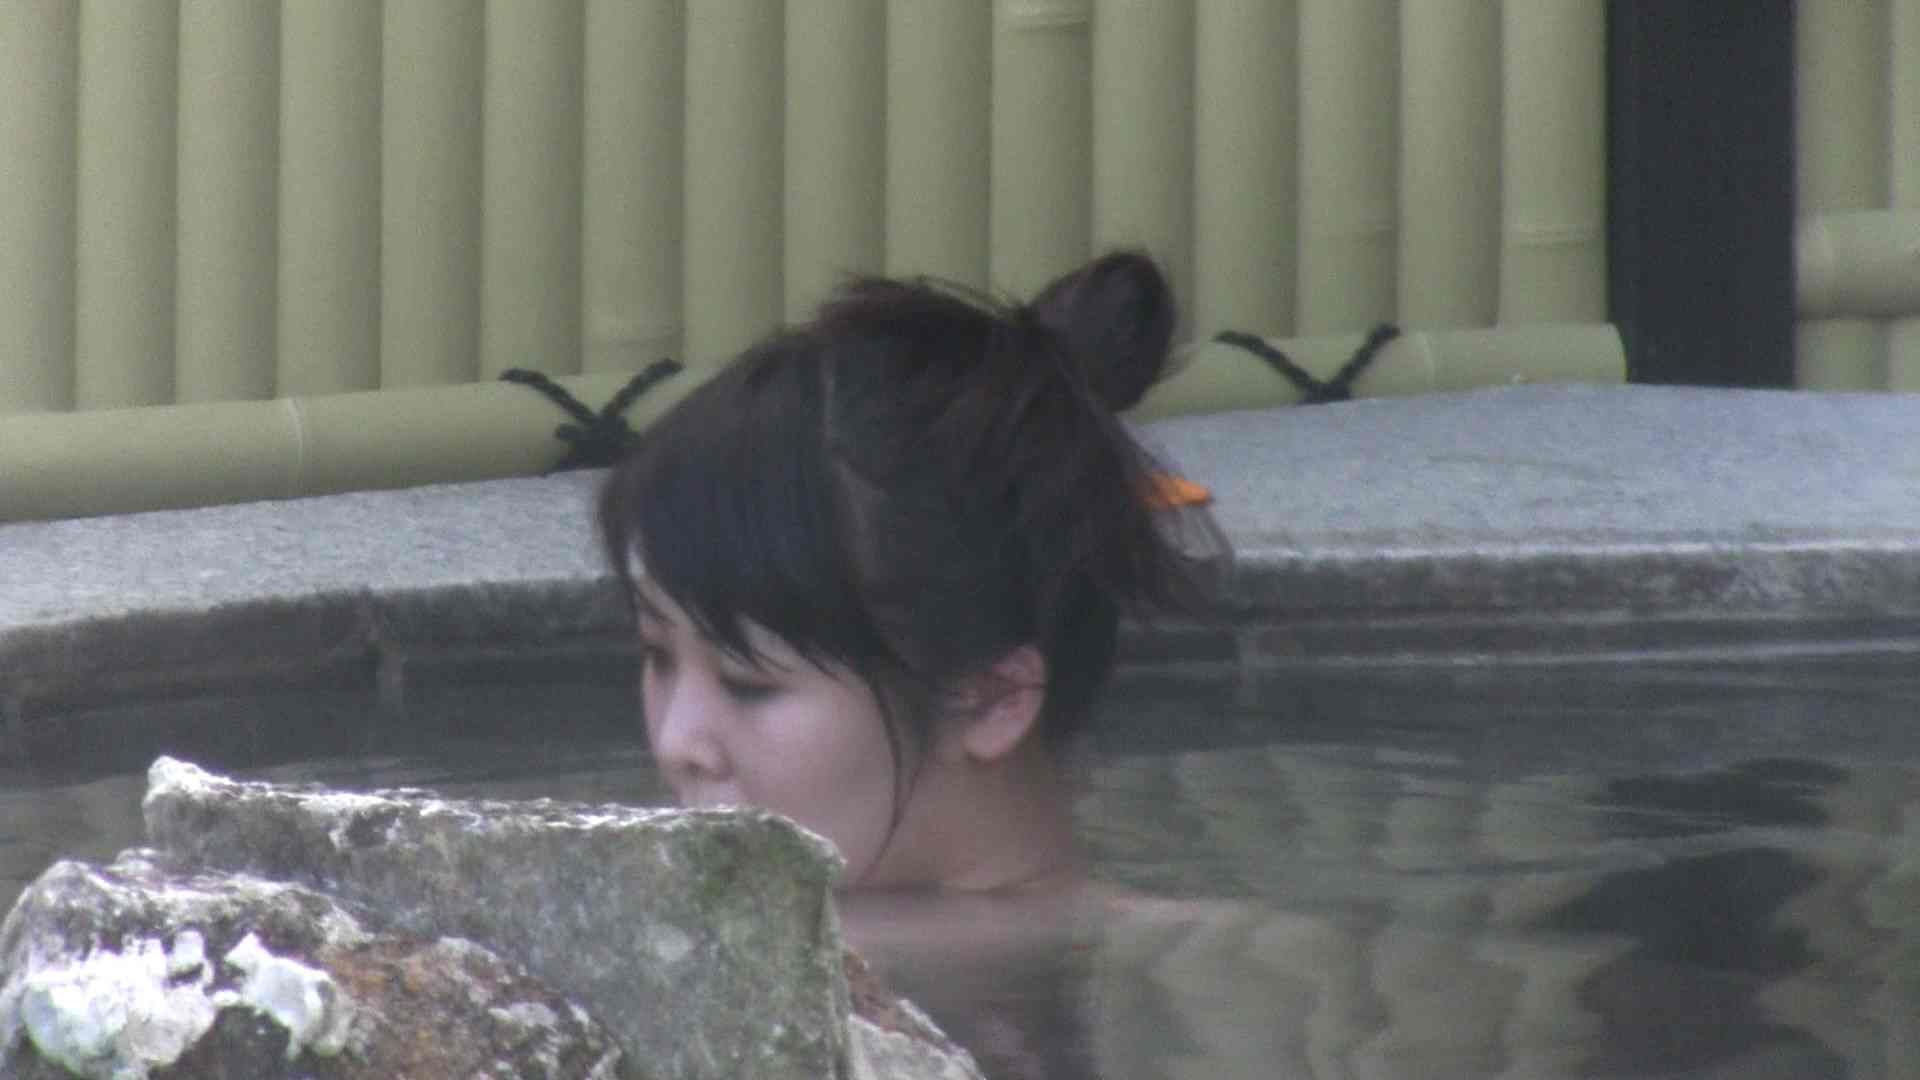 Aquaな露天風呂Vol.118 0 | 露天  85連発 45